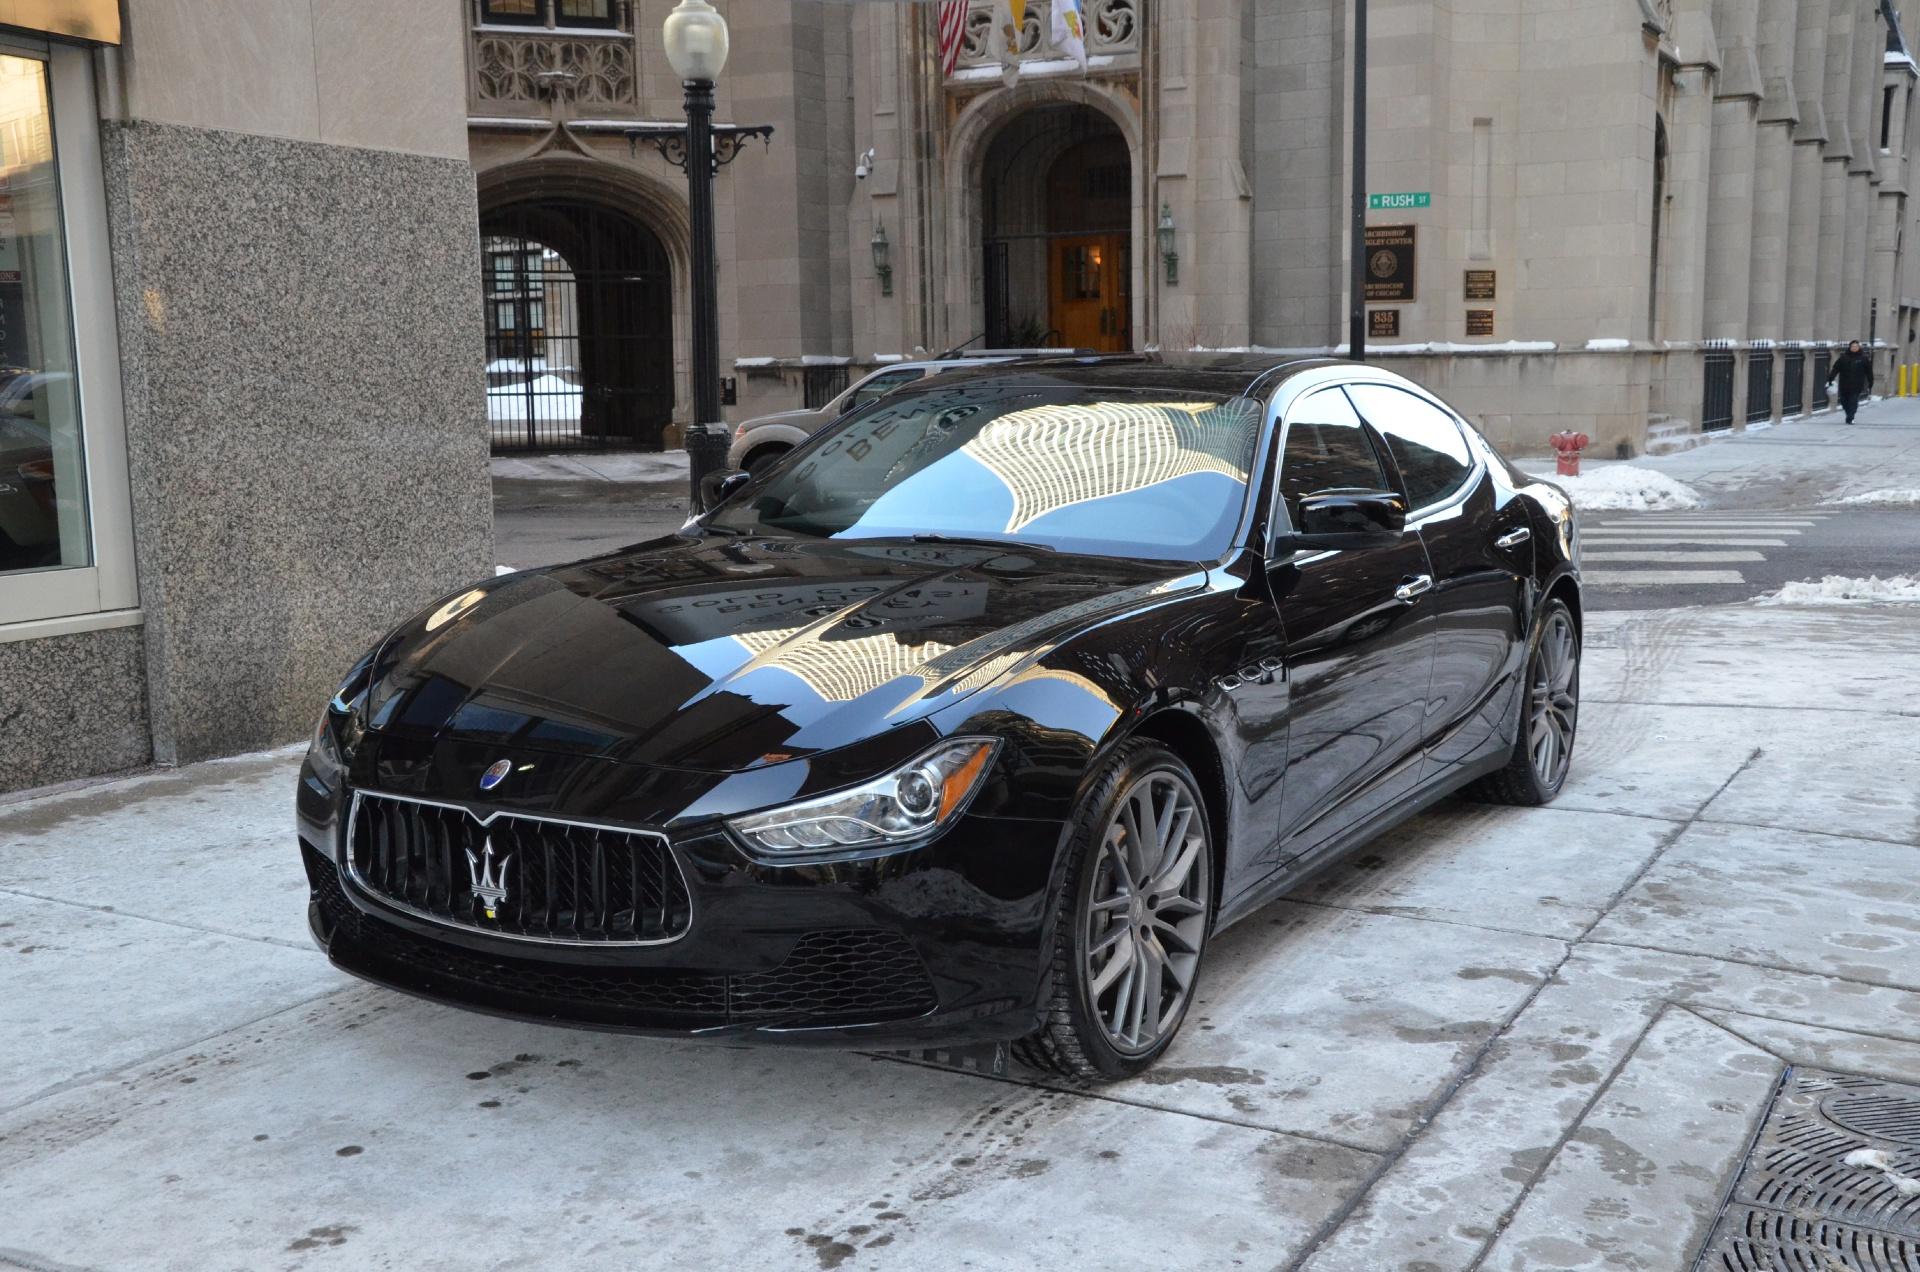 2014 Maserati Ghibli Stock M240 S For Sale Near Chicago